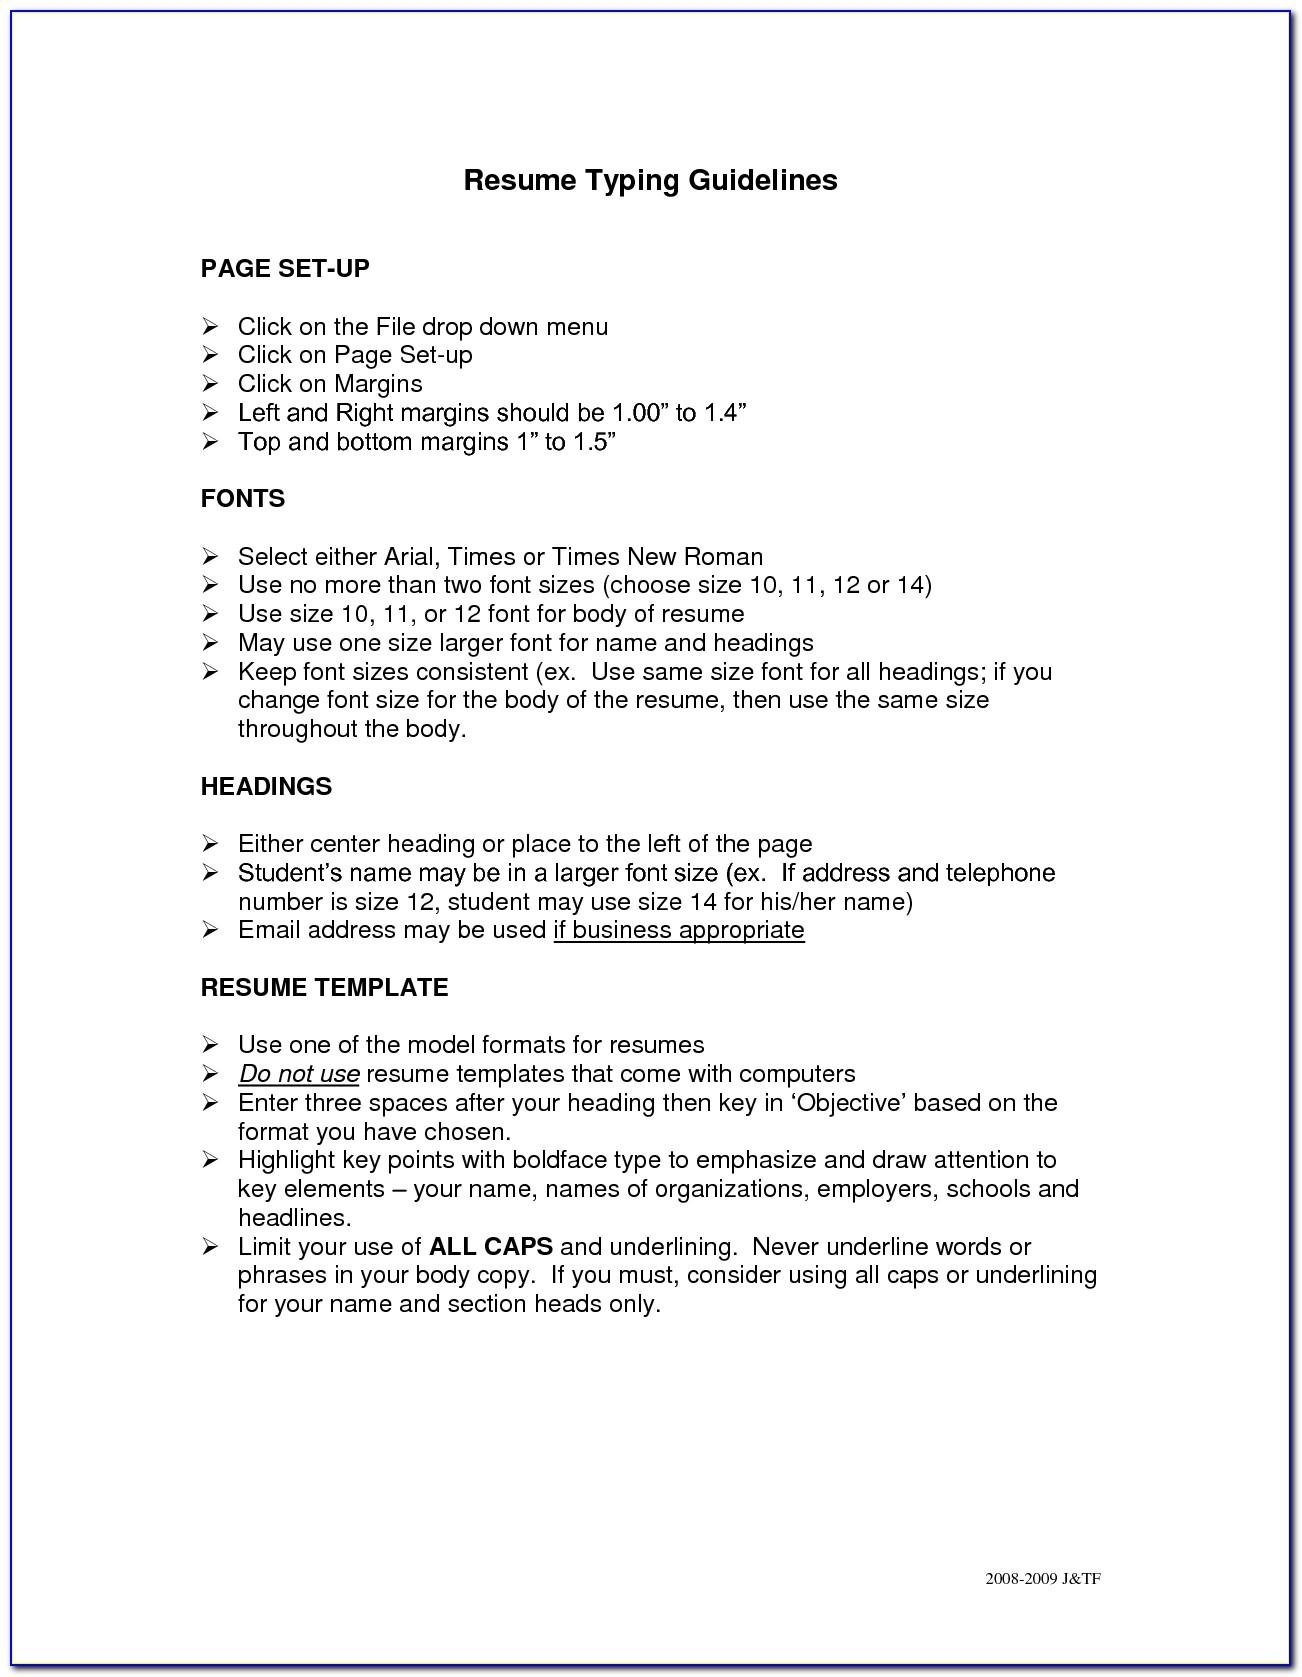 How To Prepare A Resume For A Job Fair